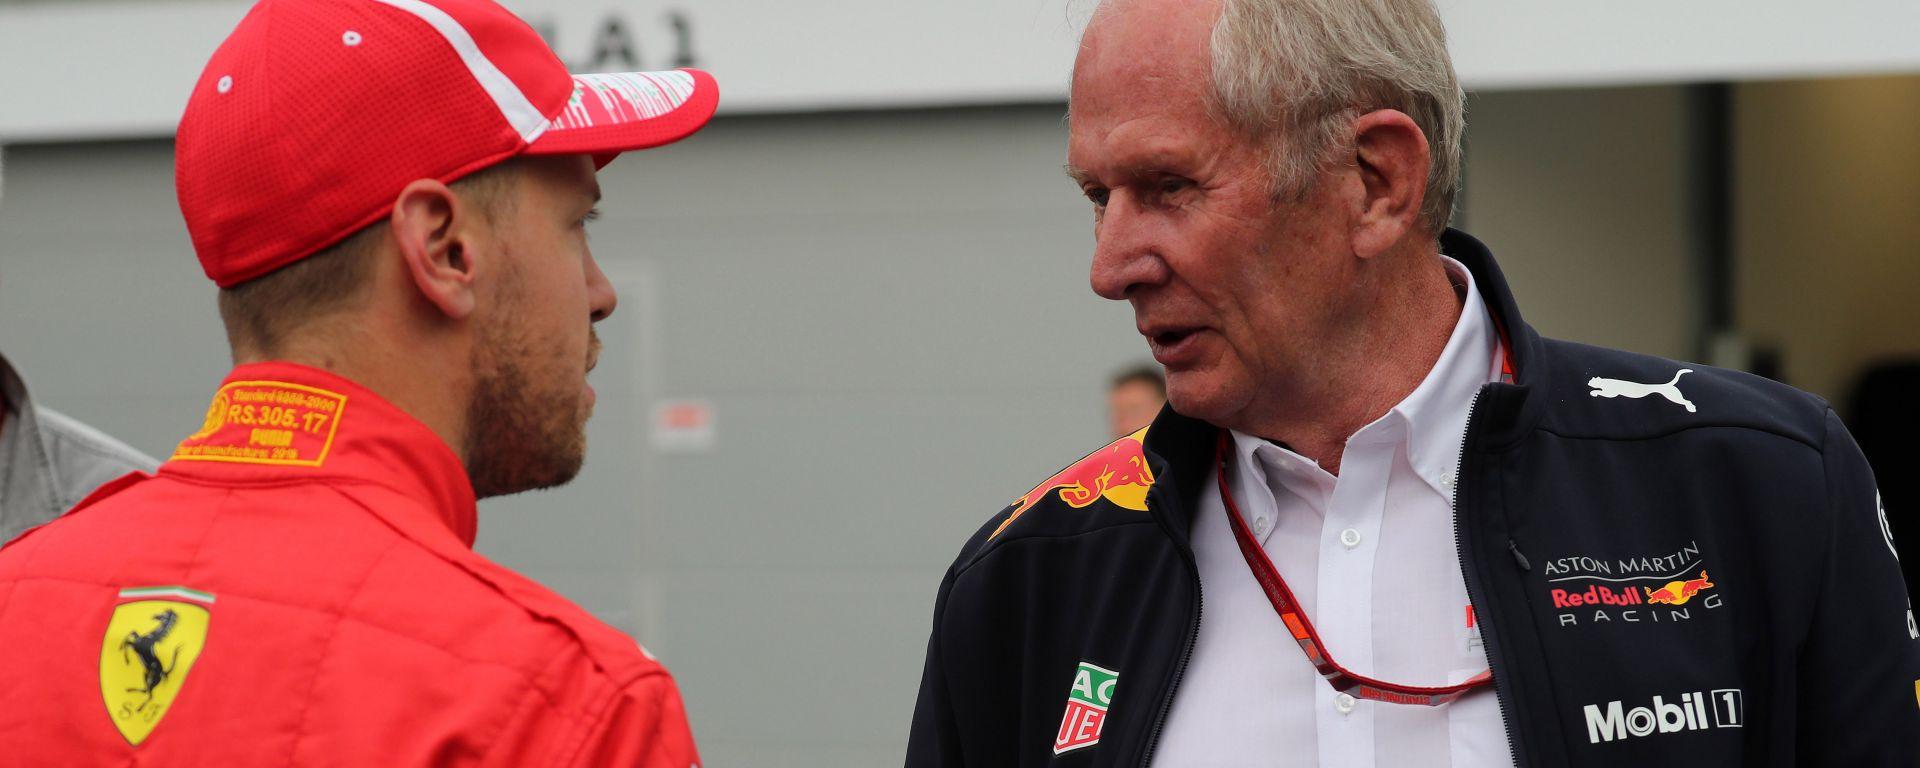 GP Azerbaijan 2019, Sebastian Vettel (Ferrari) e Helmut Marko (Red Bull)